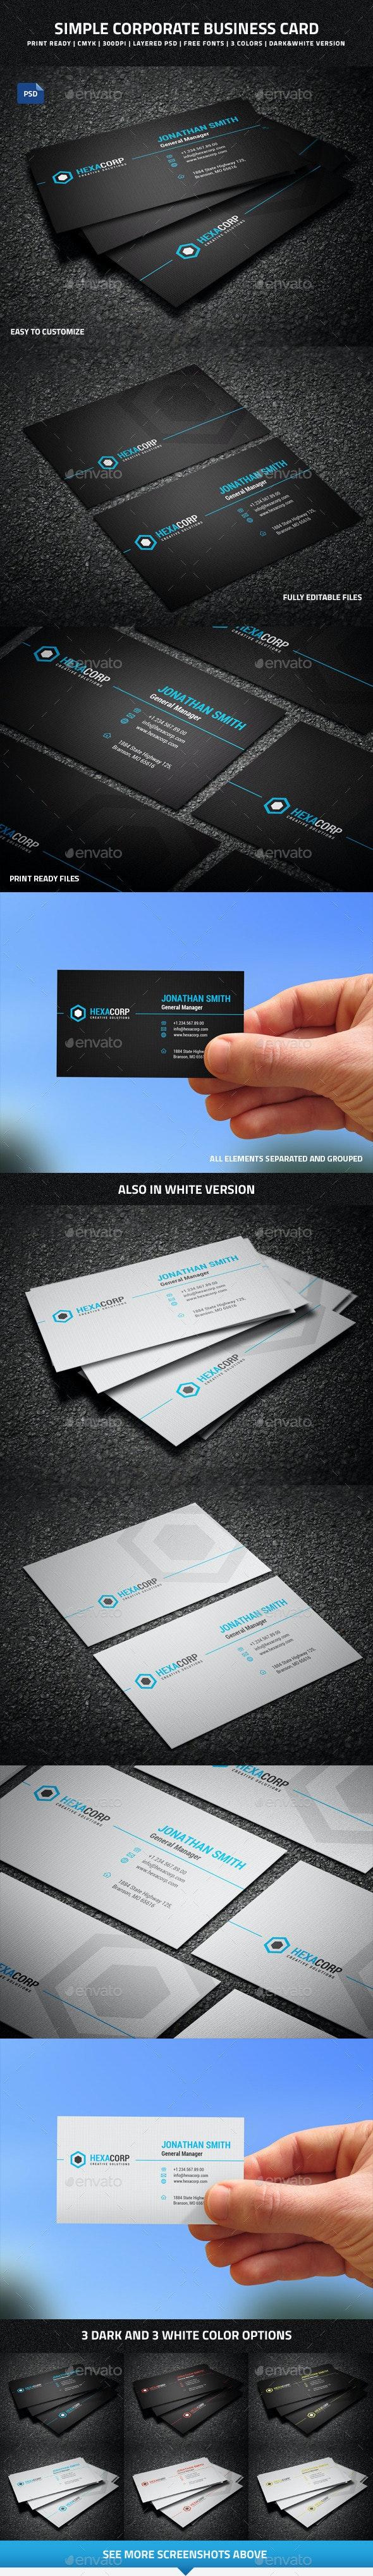 Simple Corporate Business Card - 45 - Corporate Business Cards